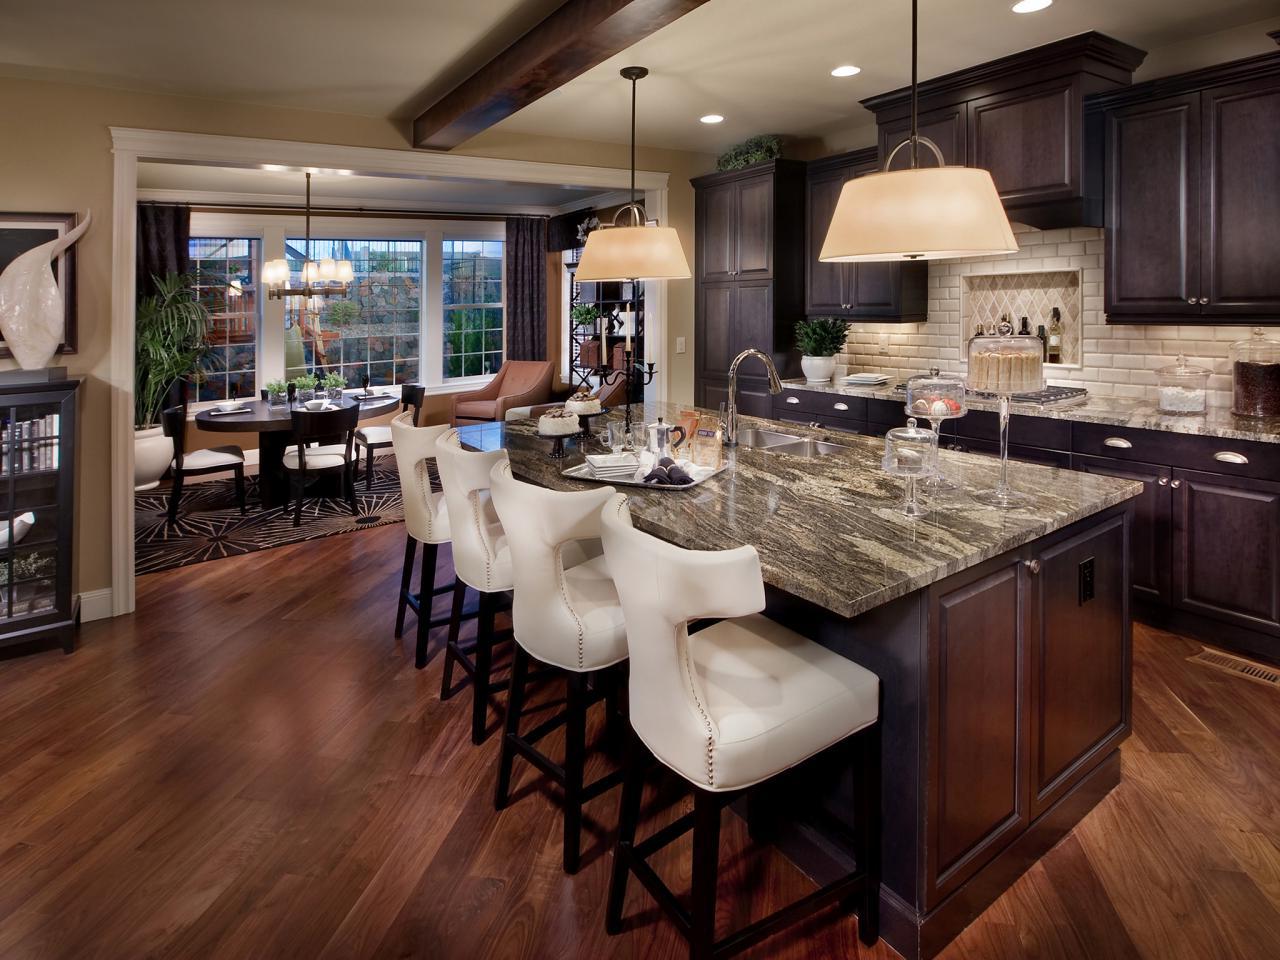 Older Home Kitchen Remodeling Ideas | Roy Home Design on Remodeling Ideas  id=60287